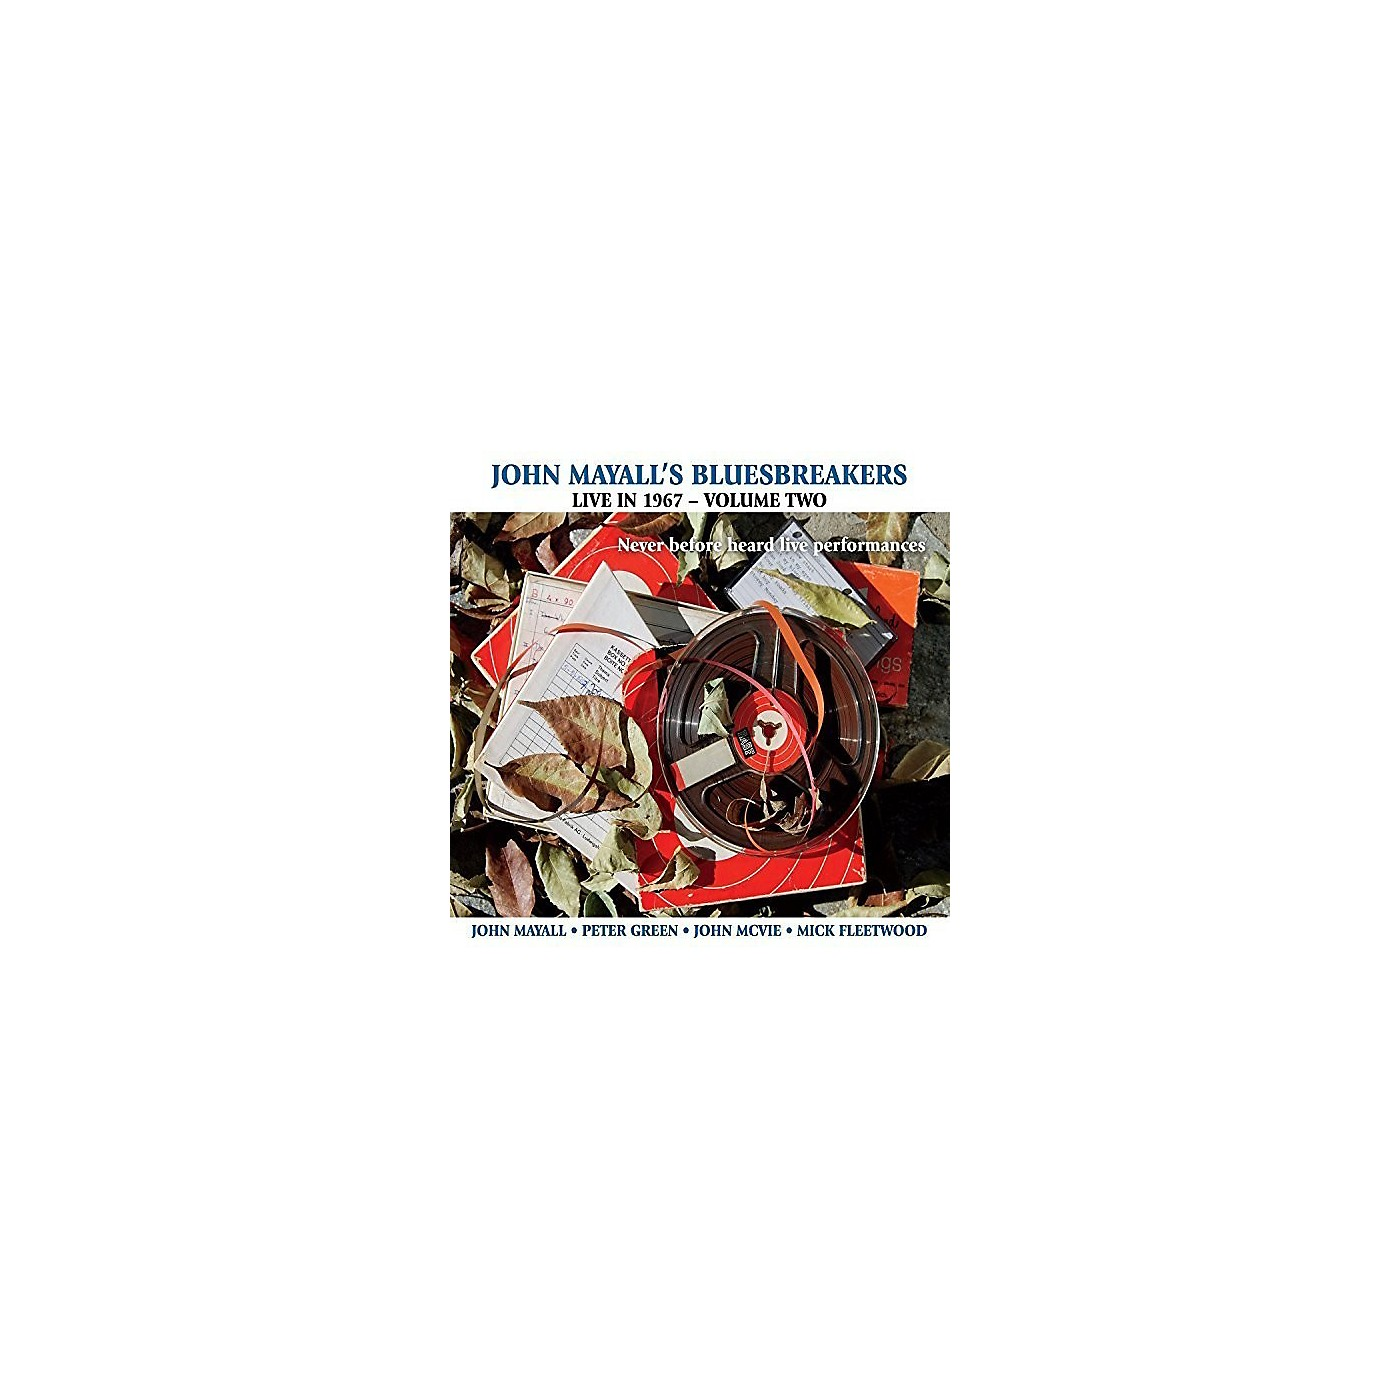 Alliance John Mayall's Bluesbreakers - Live in 1967- Volume 2 thumbnail